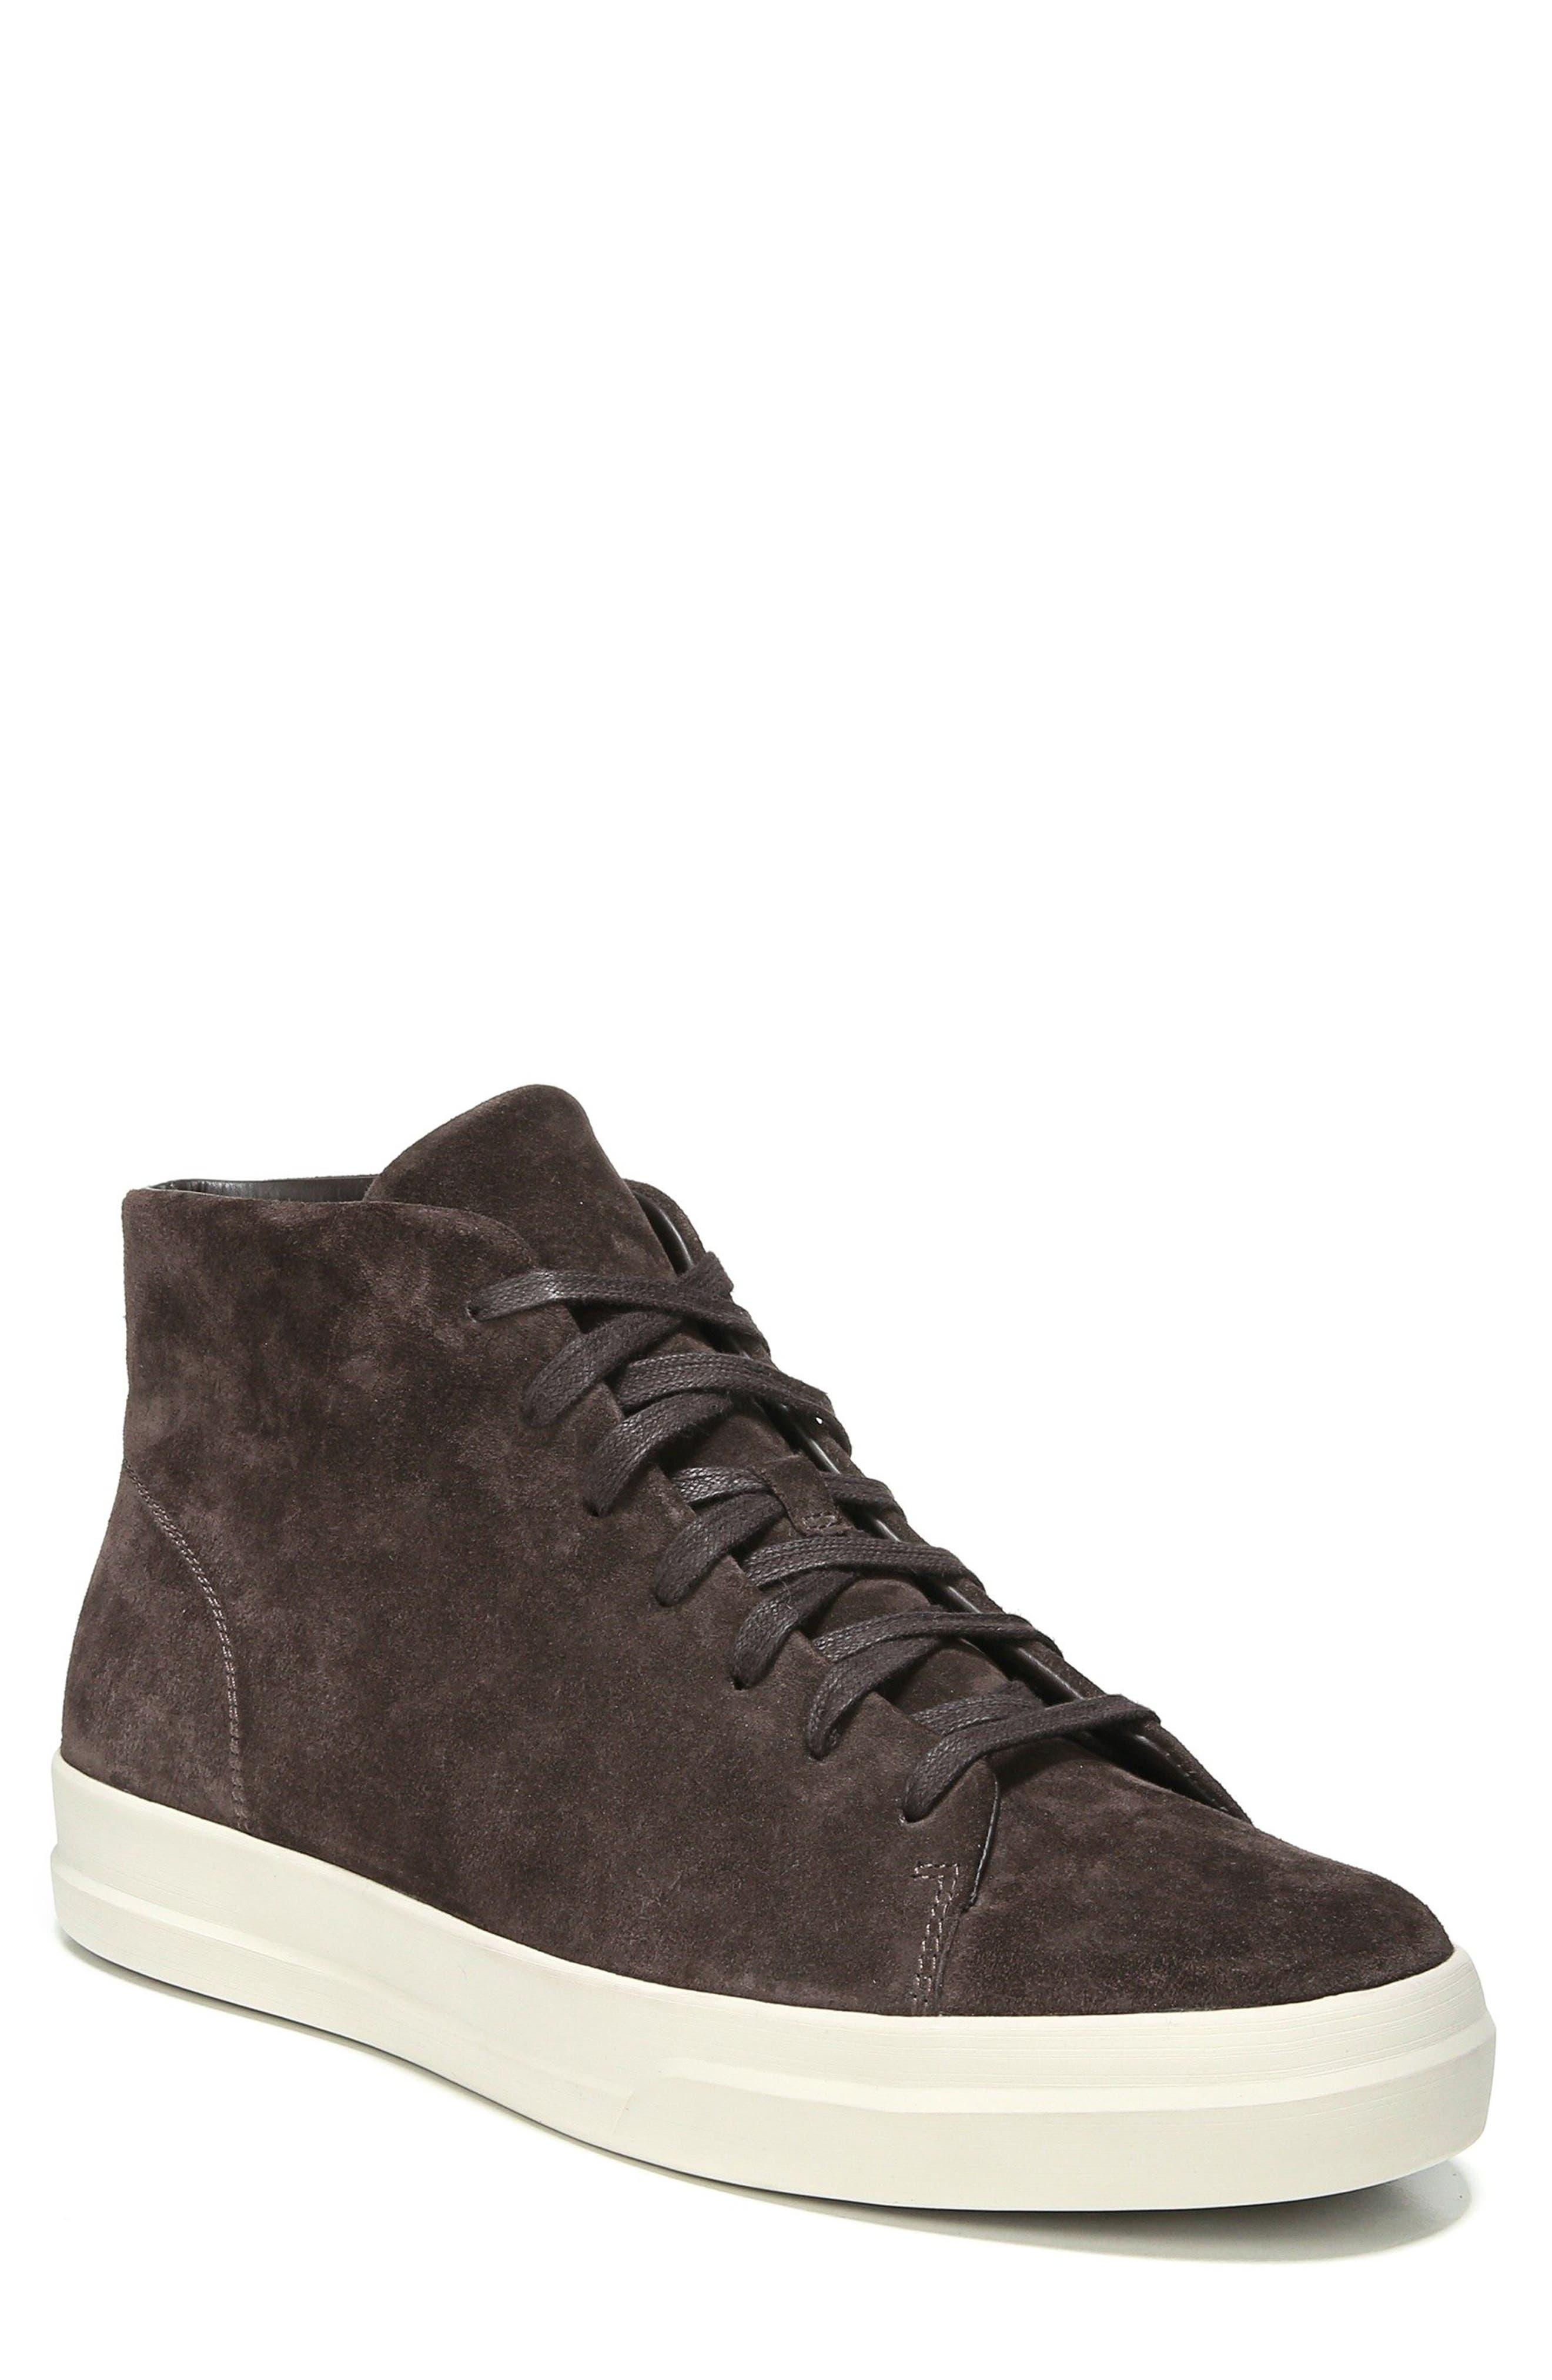 Cullen Sneaker,                             Main thumbnail 1, color,                             Espresso